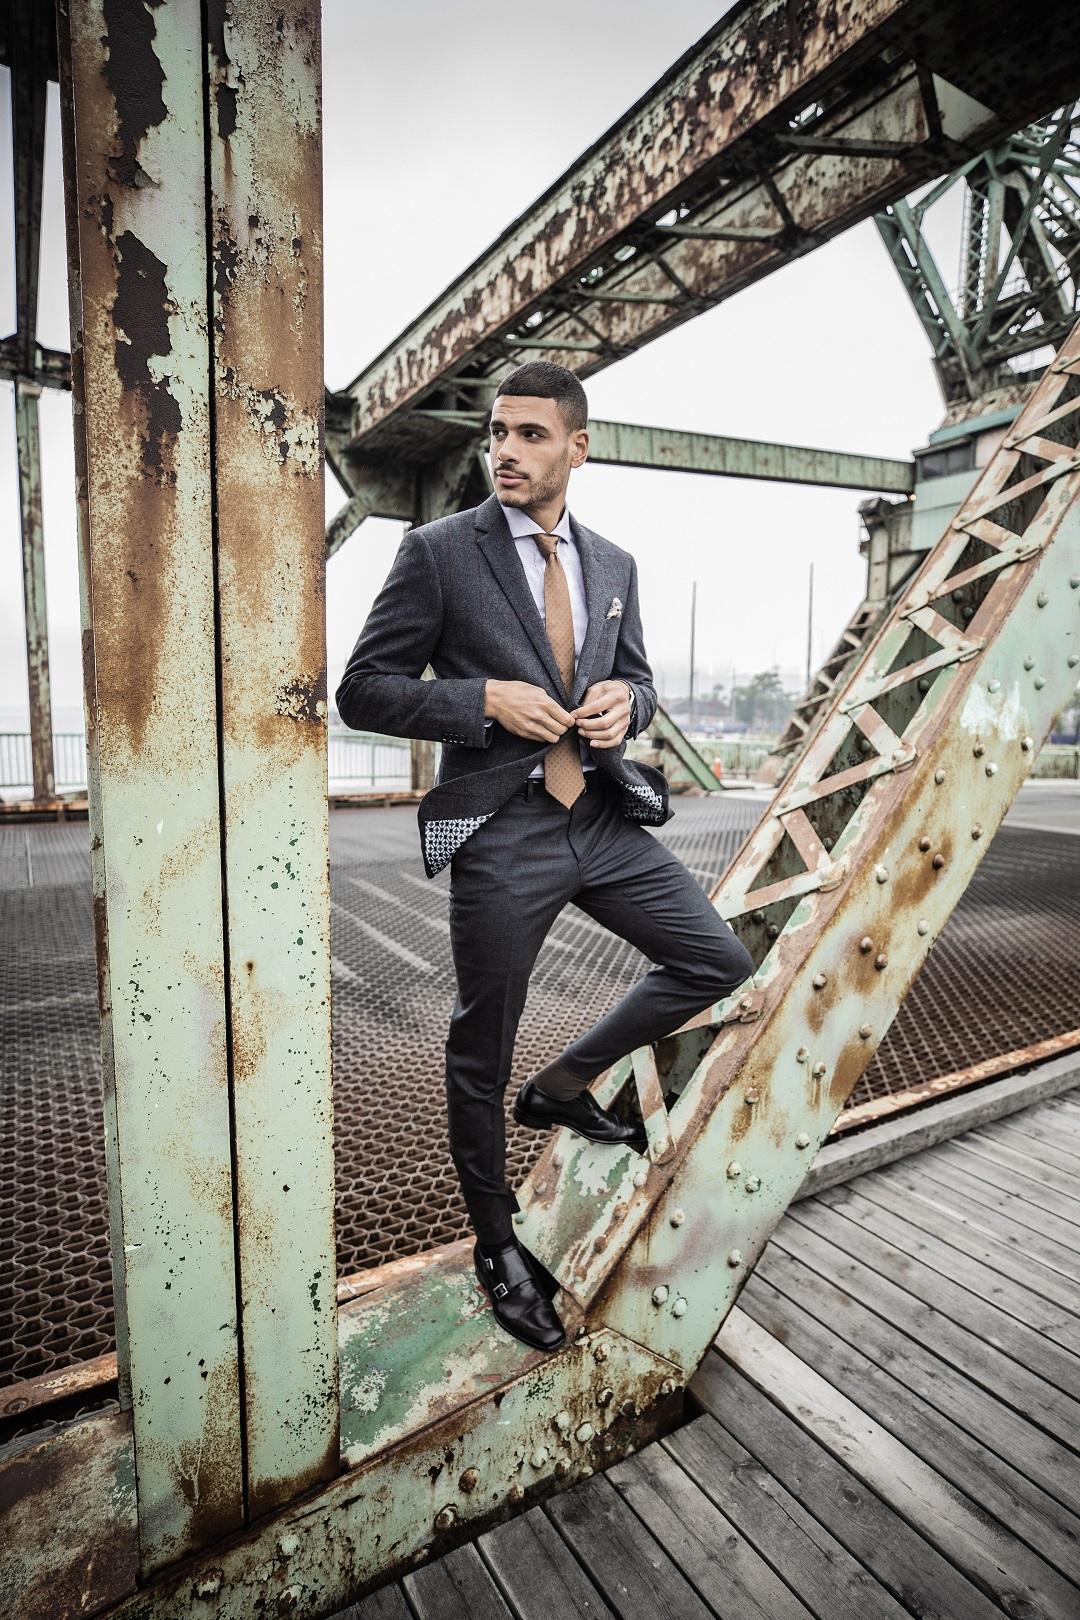 Salford Check Blazer and Hayward Flannel Charcoal Pants